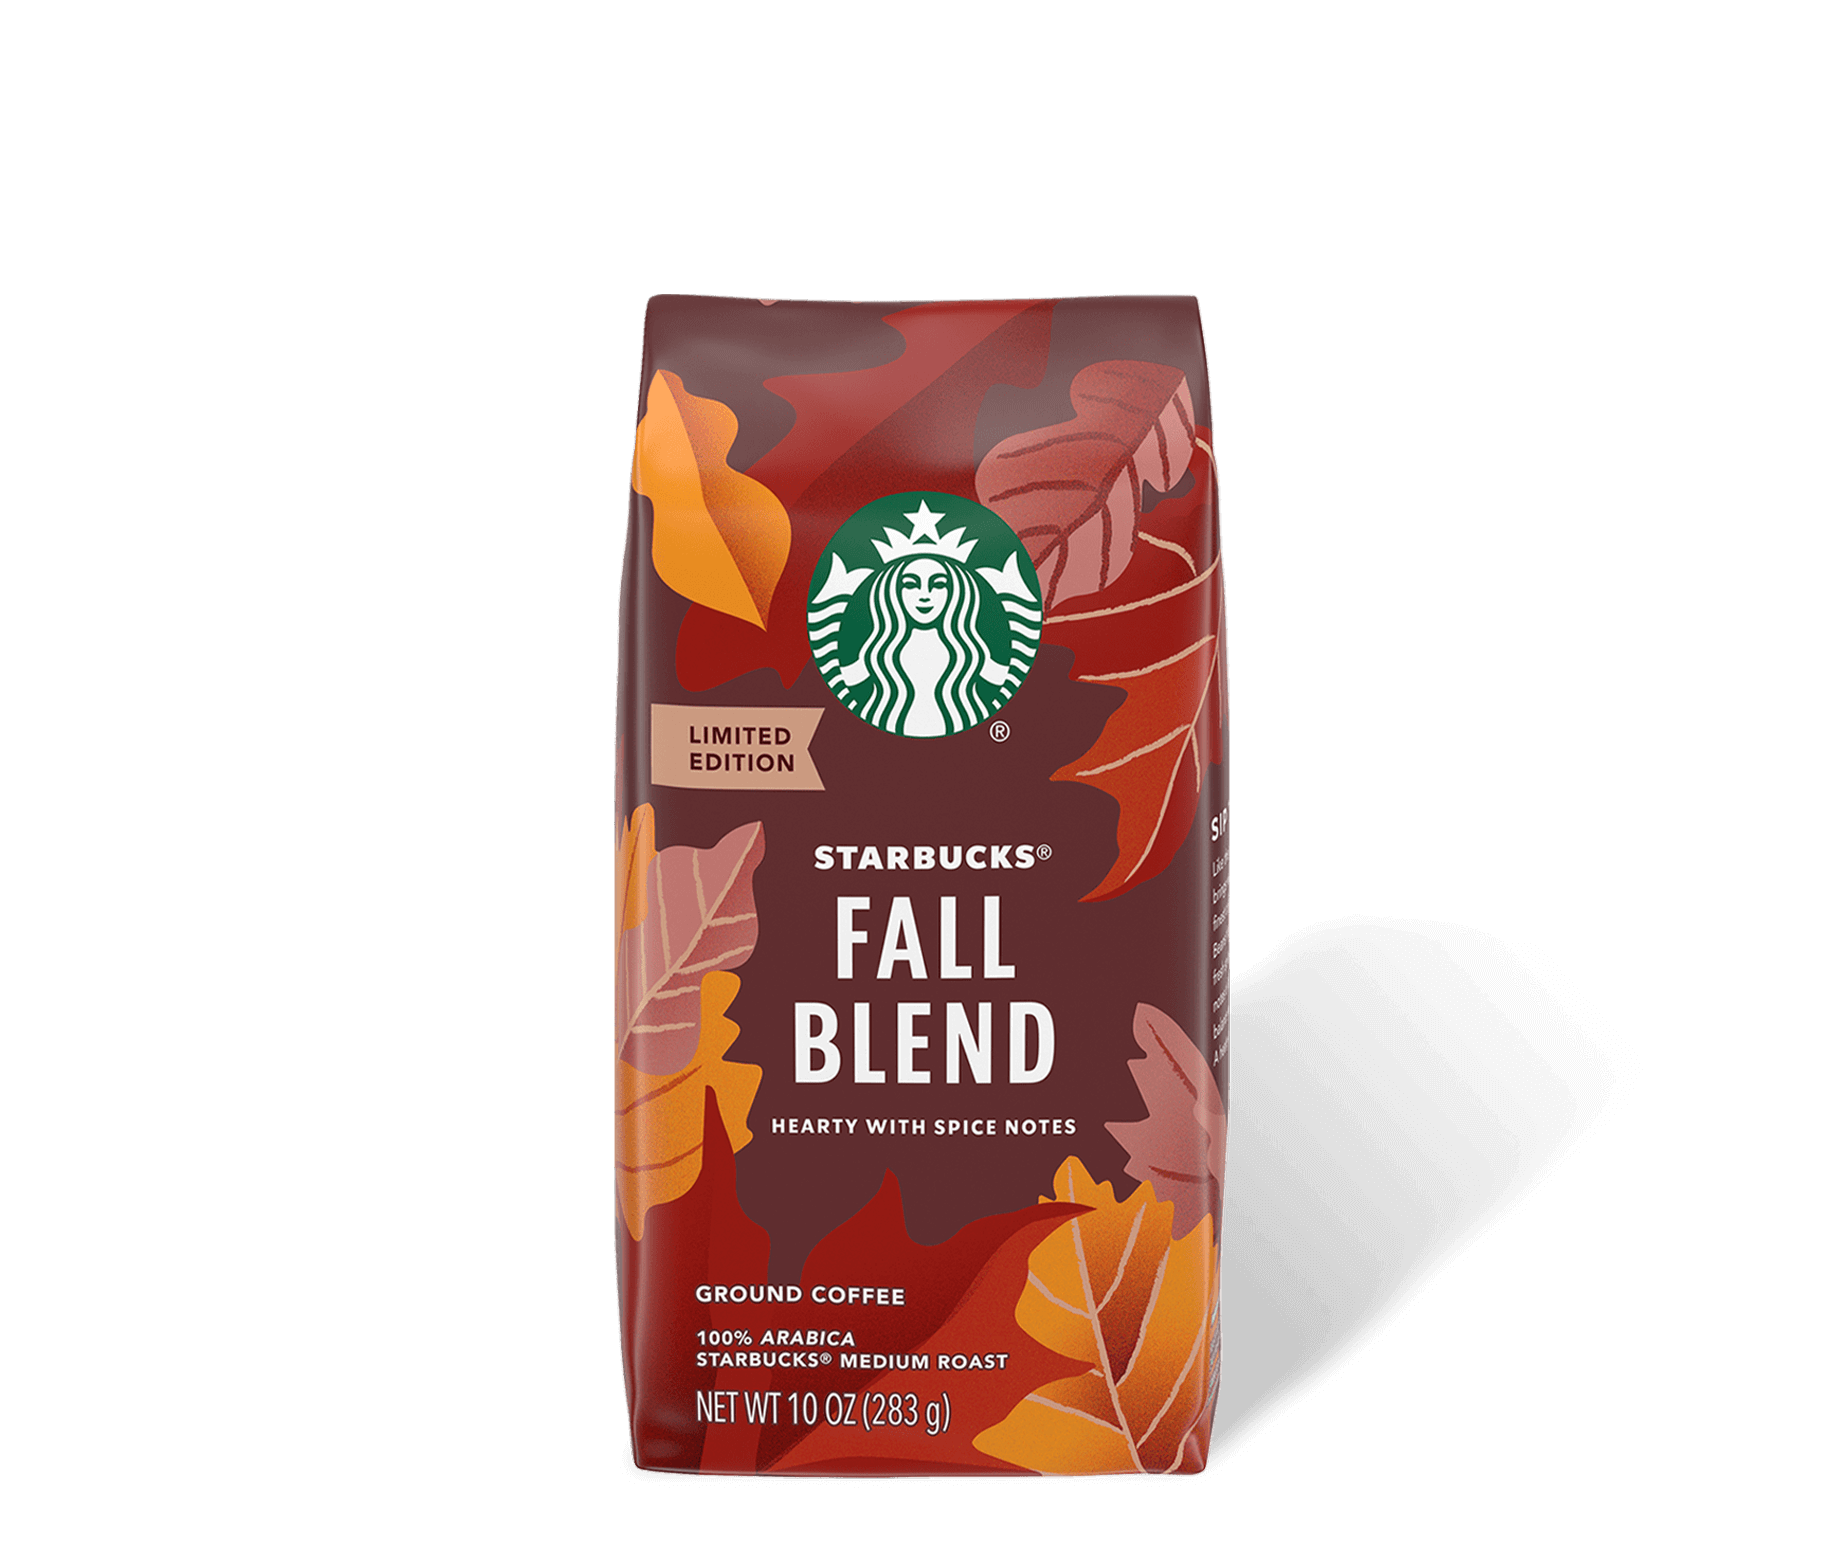 Fall Blend Ground Coffee